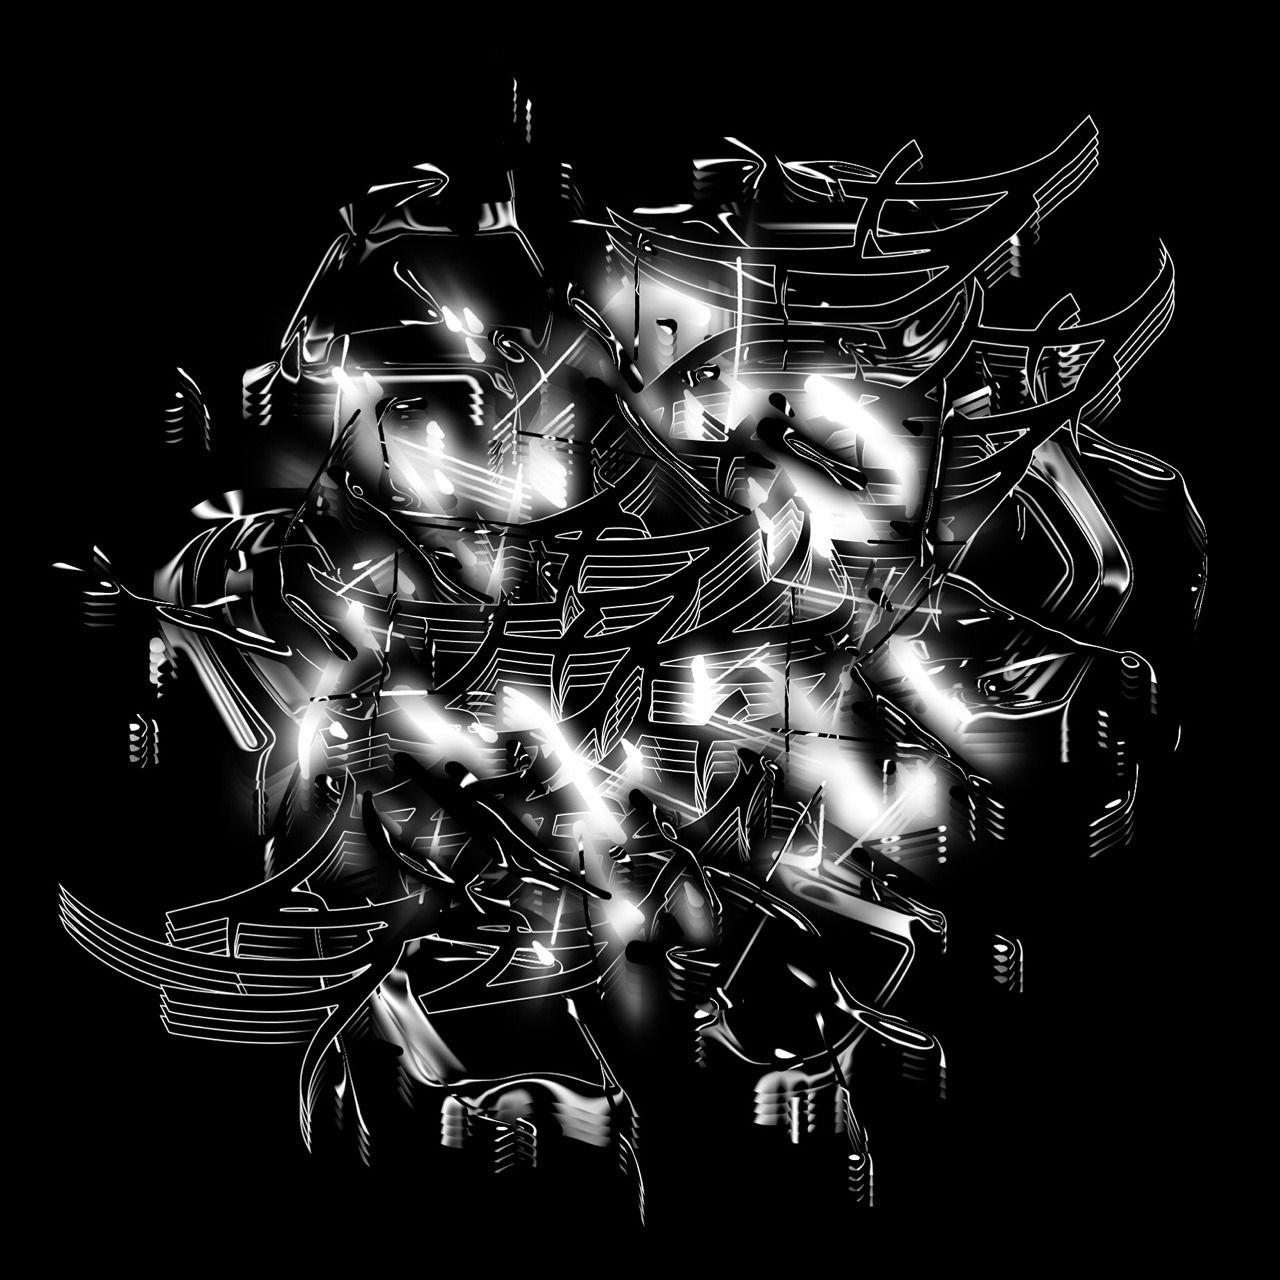 MIKEY JOYCE Cybergoth, Artwork, Art